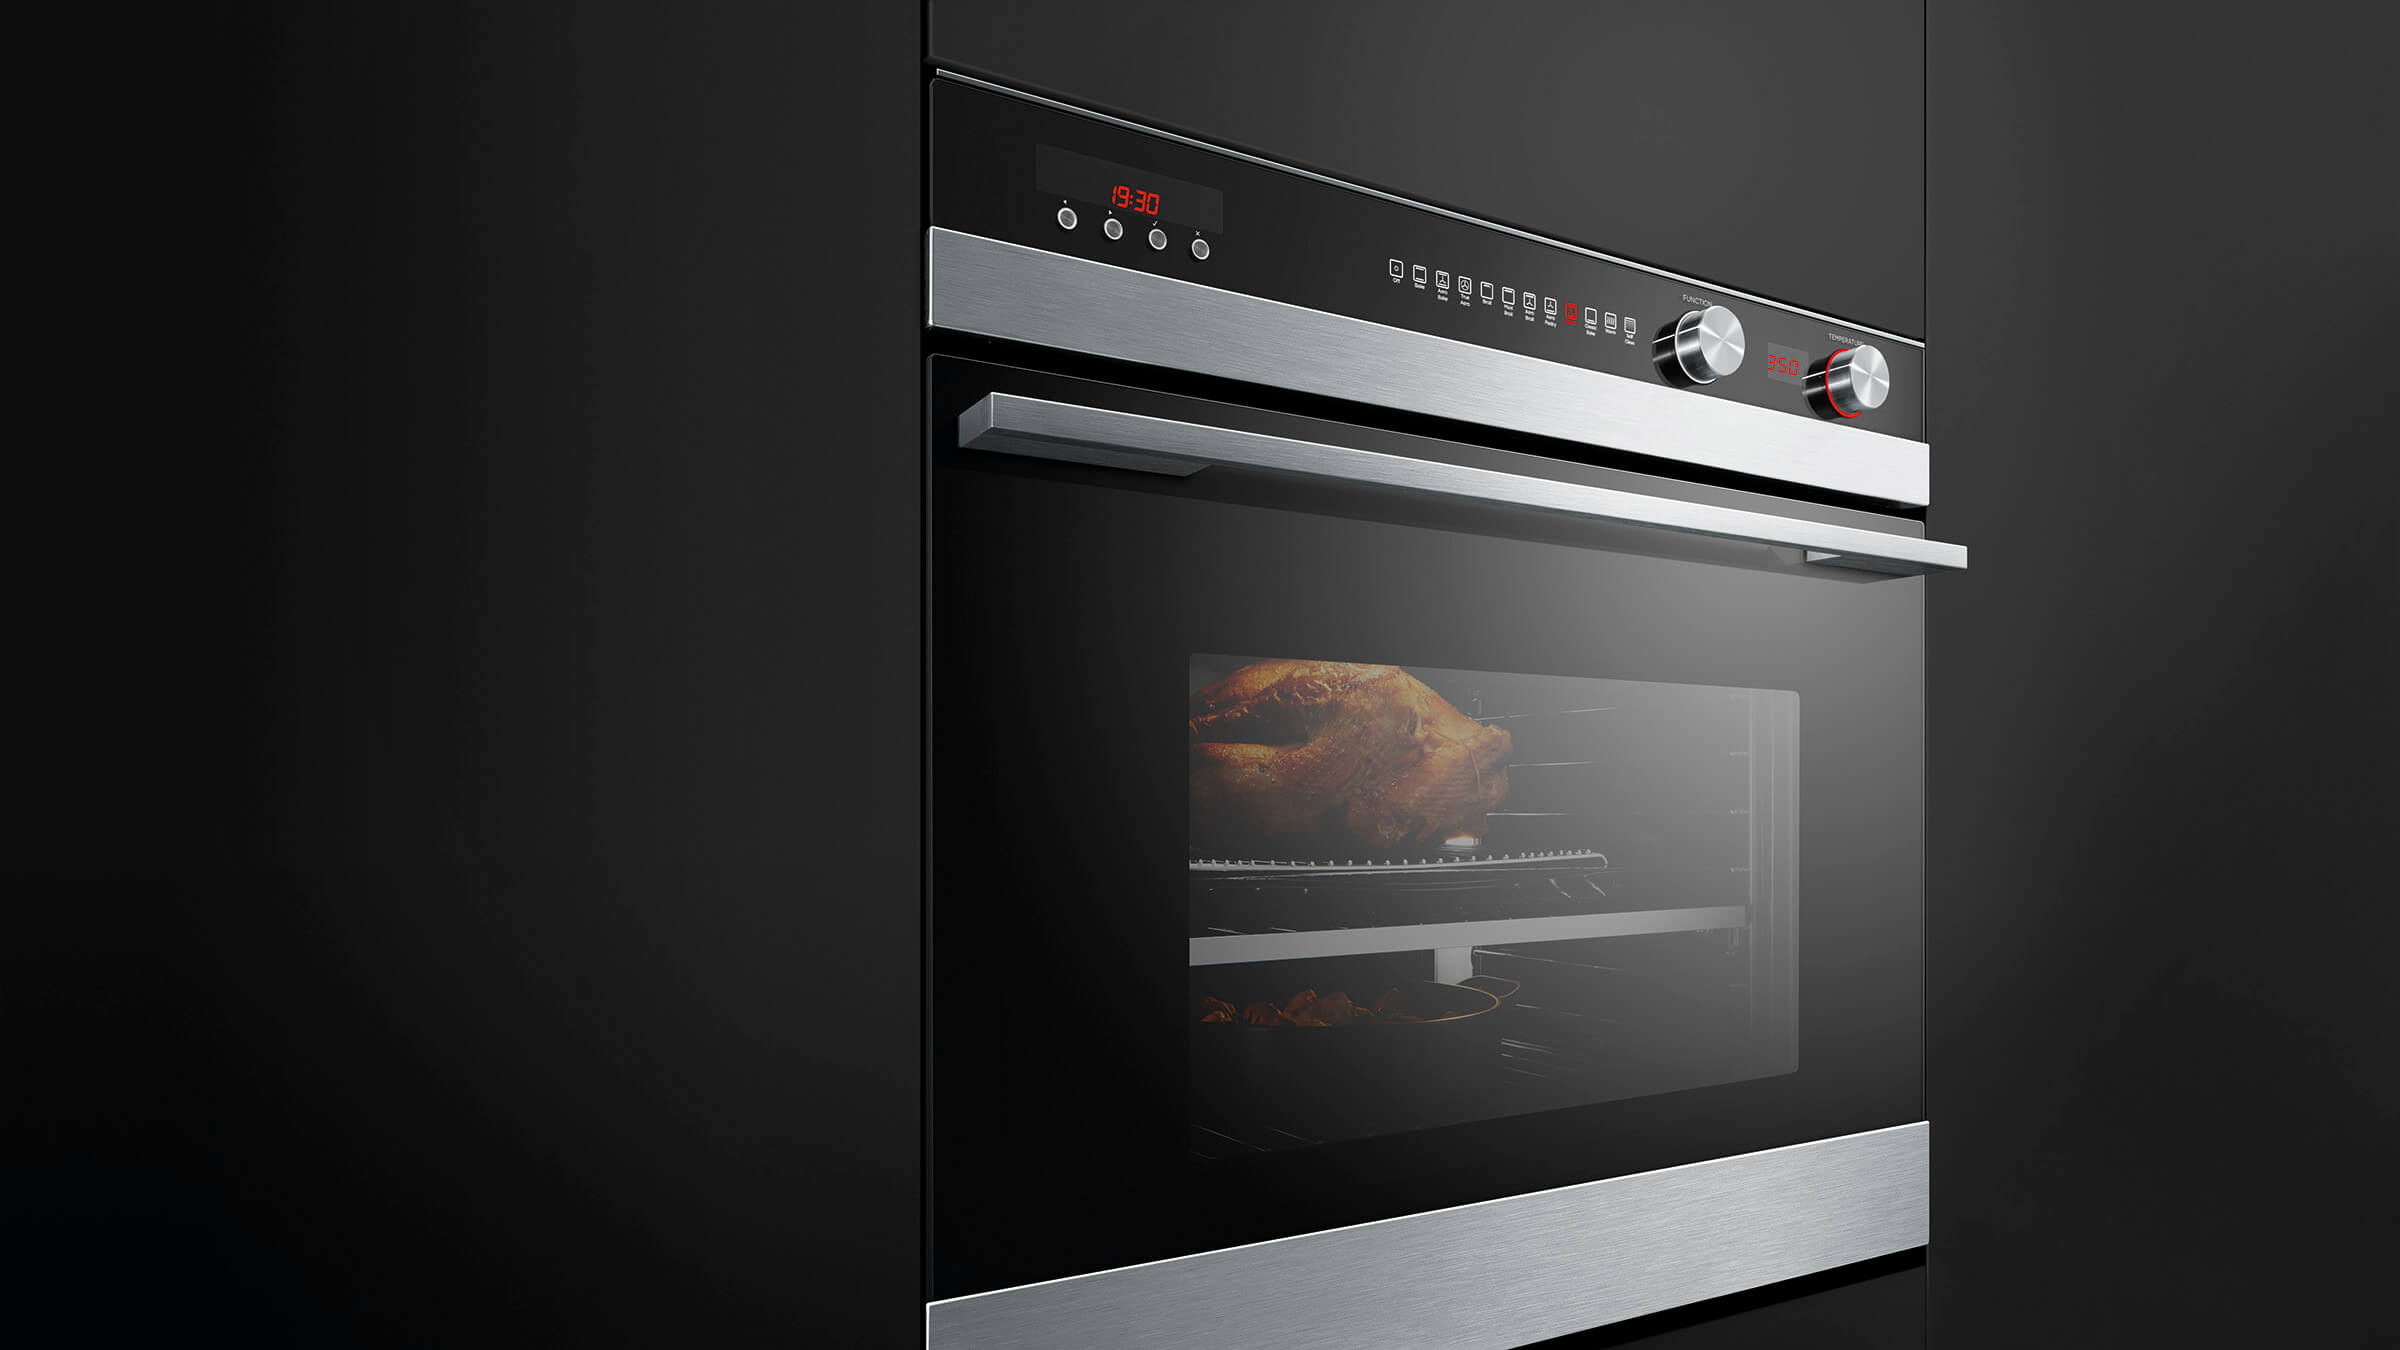 Premium kitchen appliances